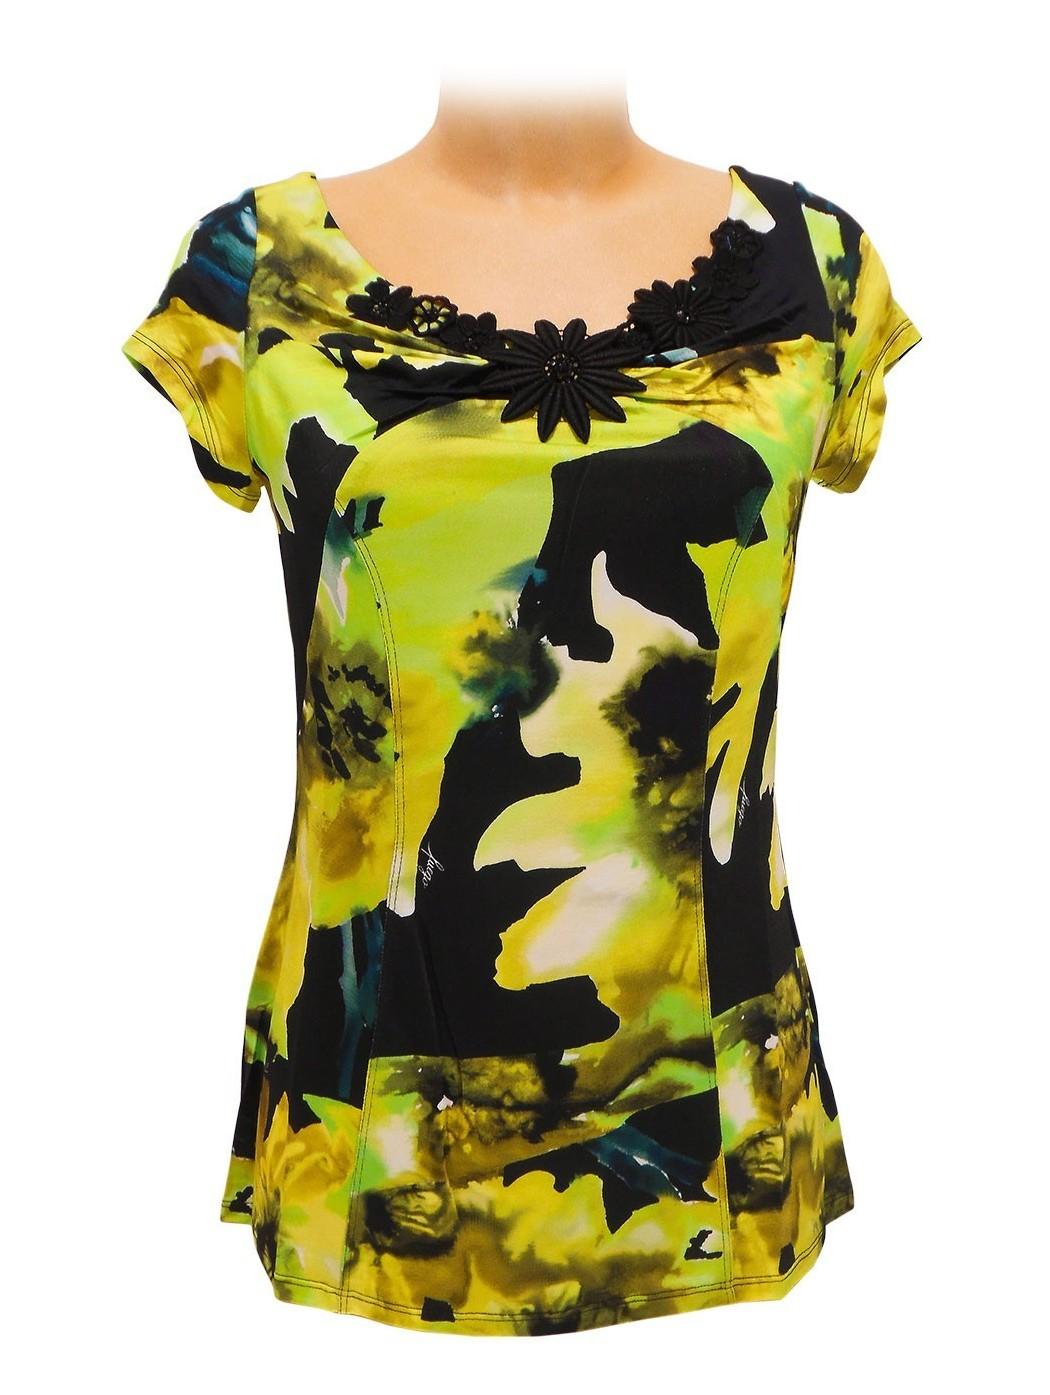 Green and yellow print t-shirt